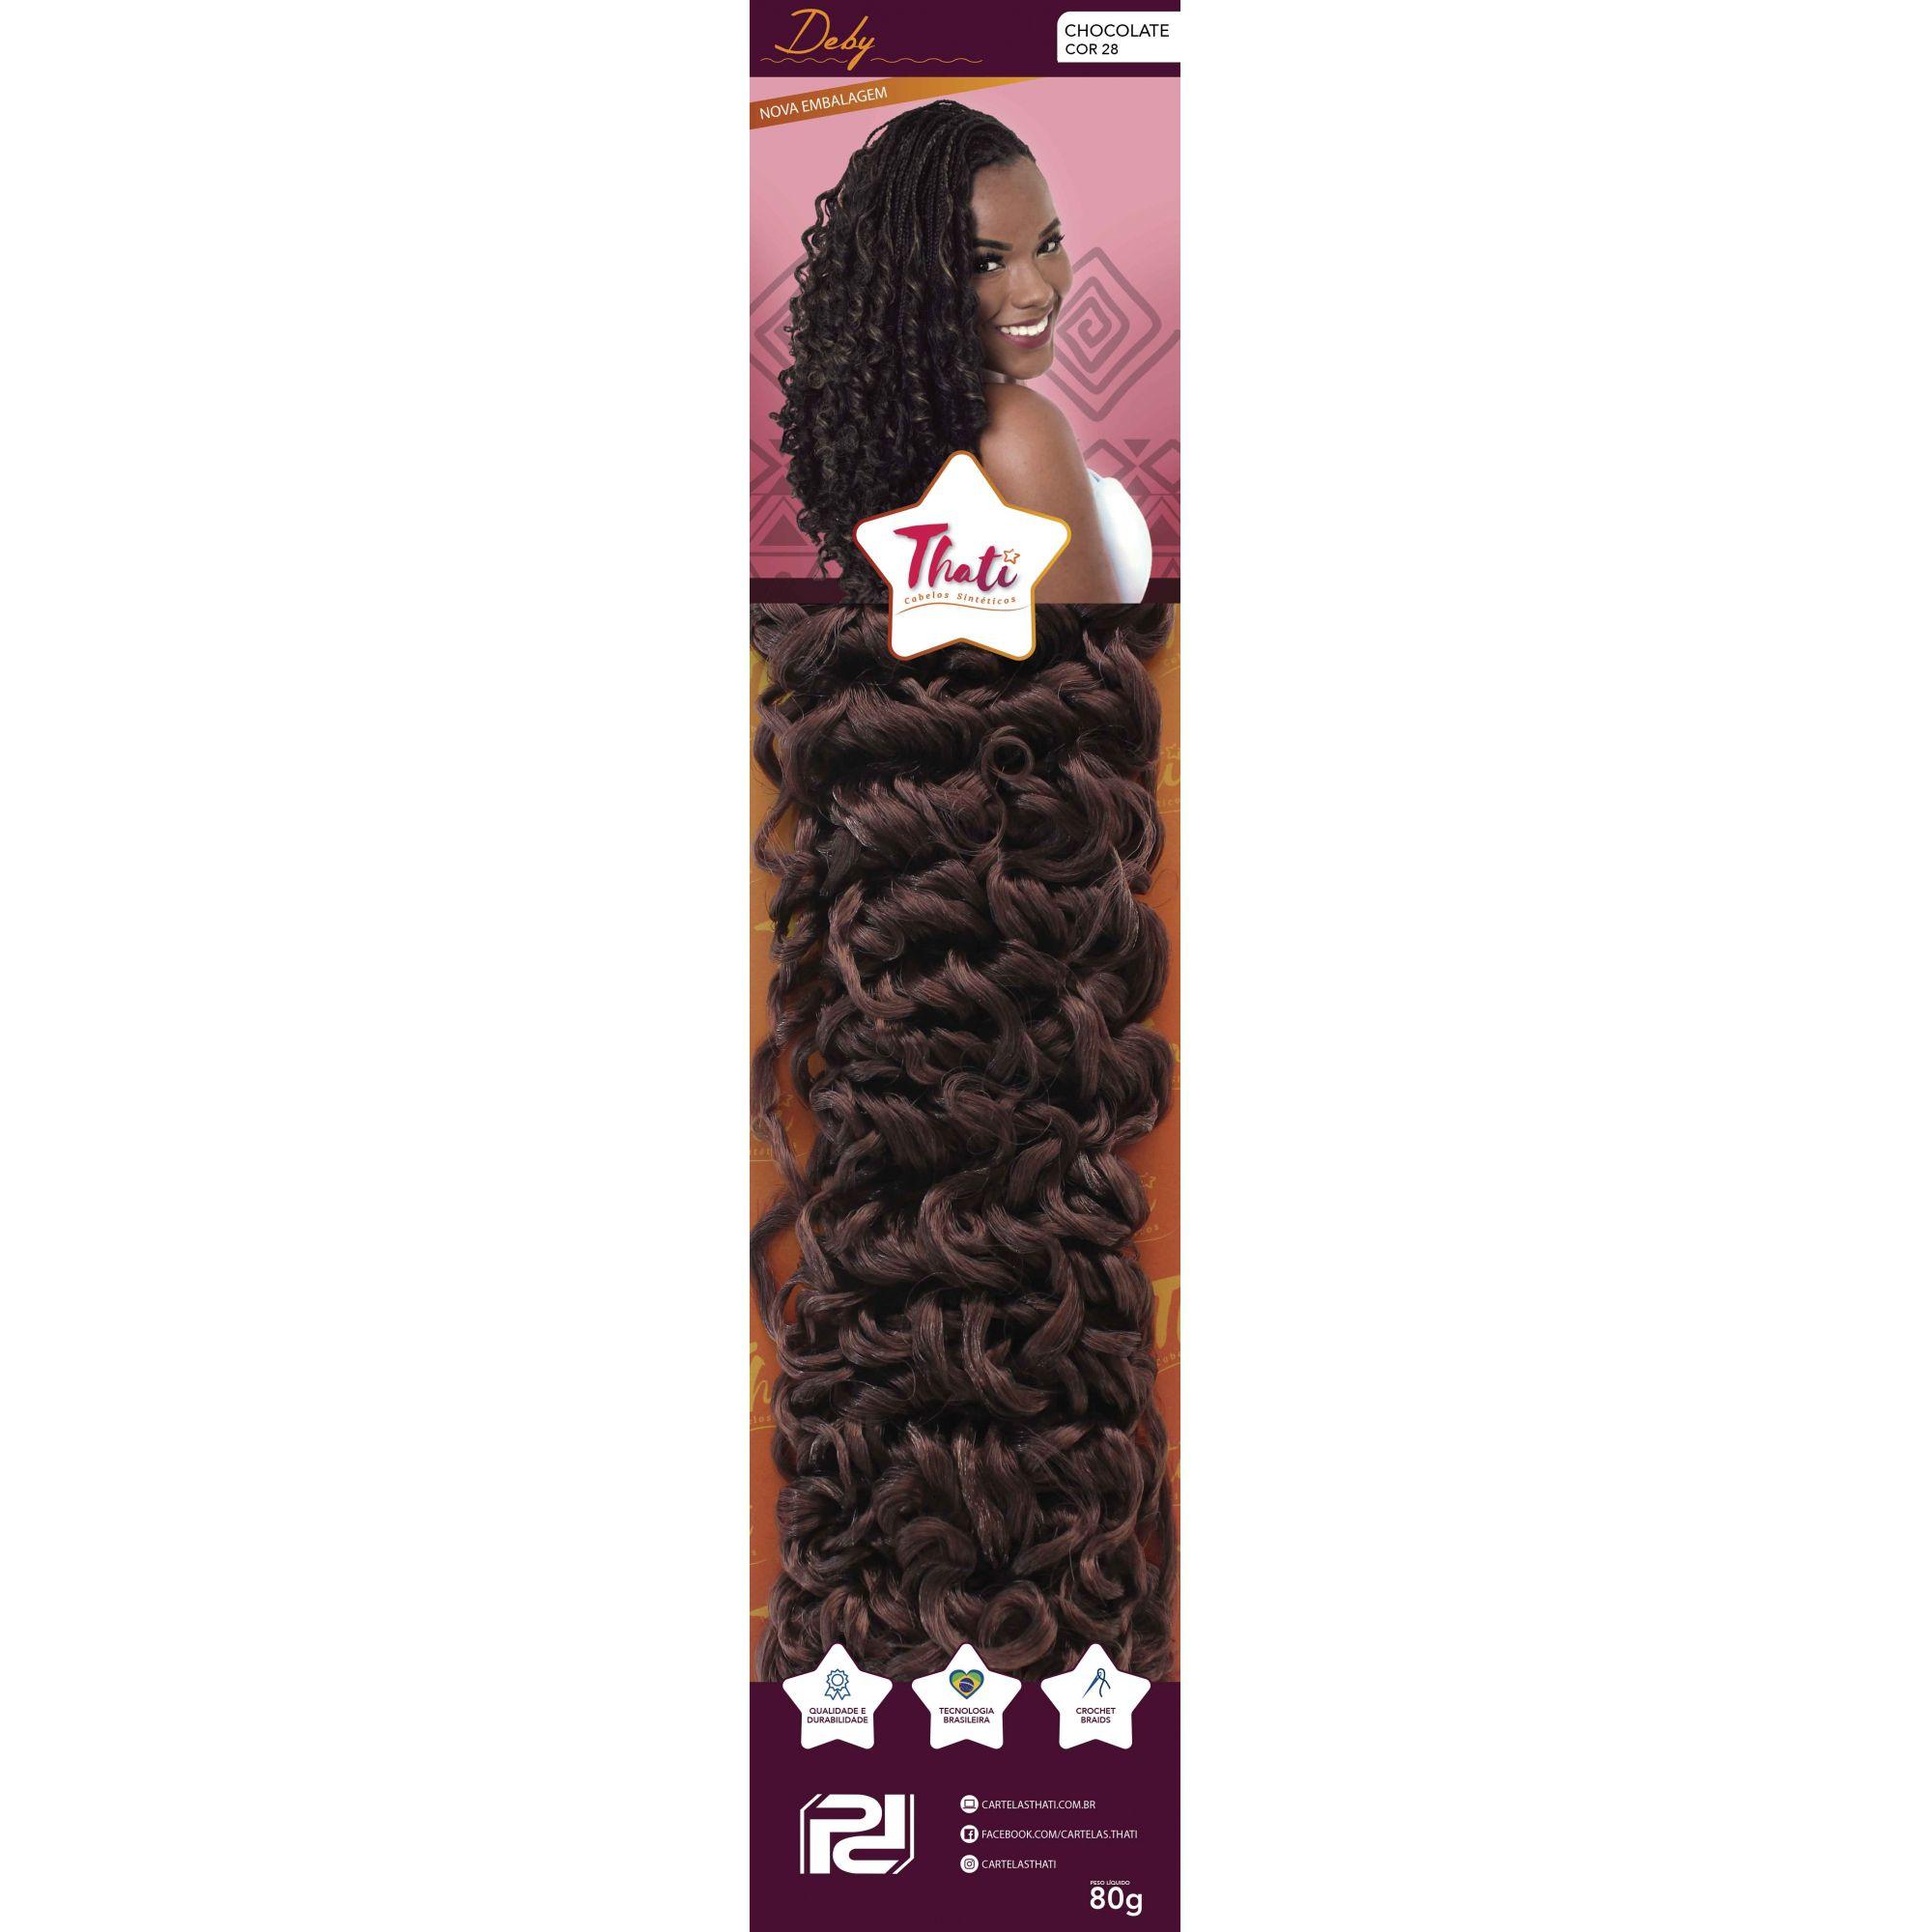 Kit Cartelas Thati Deby - Cor 28 Chocolate (Kit Promocional) - Compre 4, leve 5!